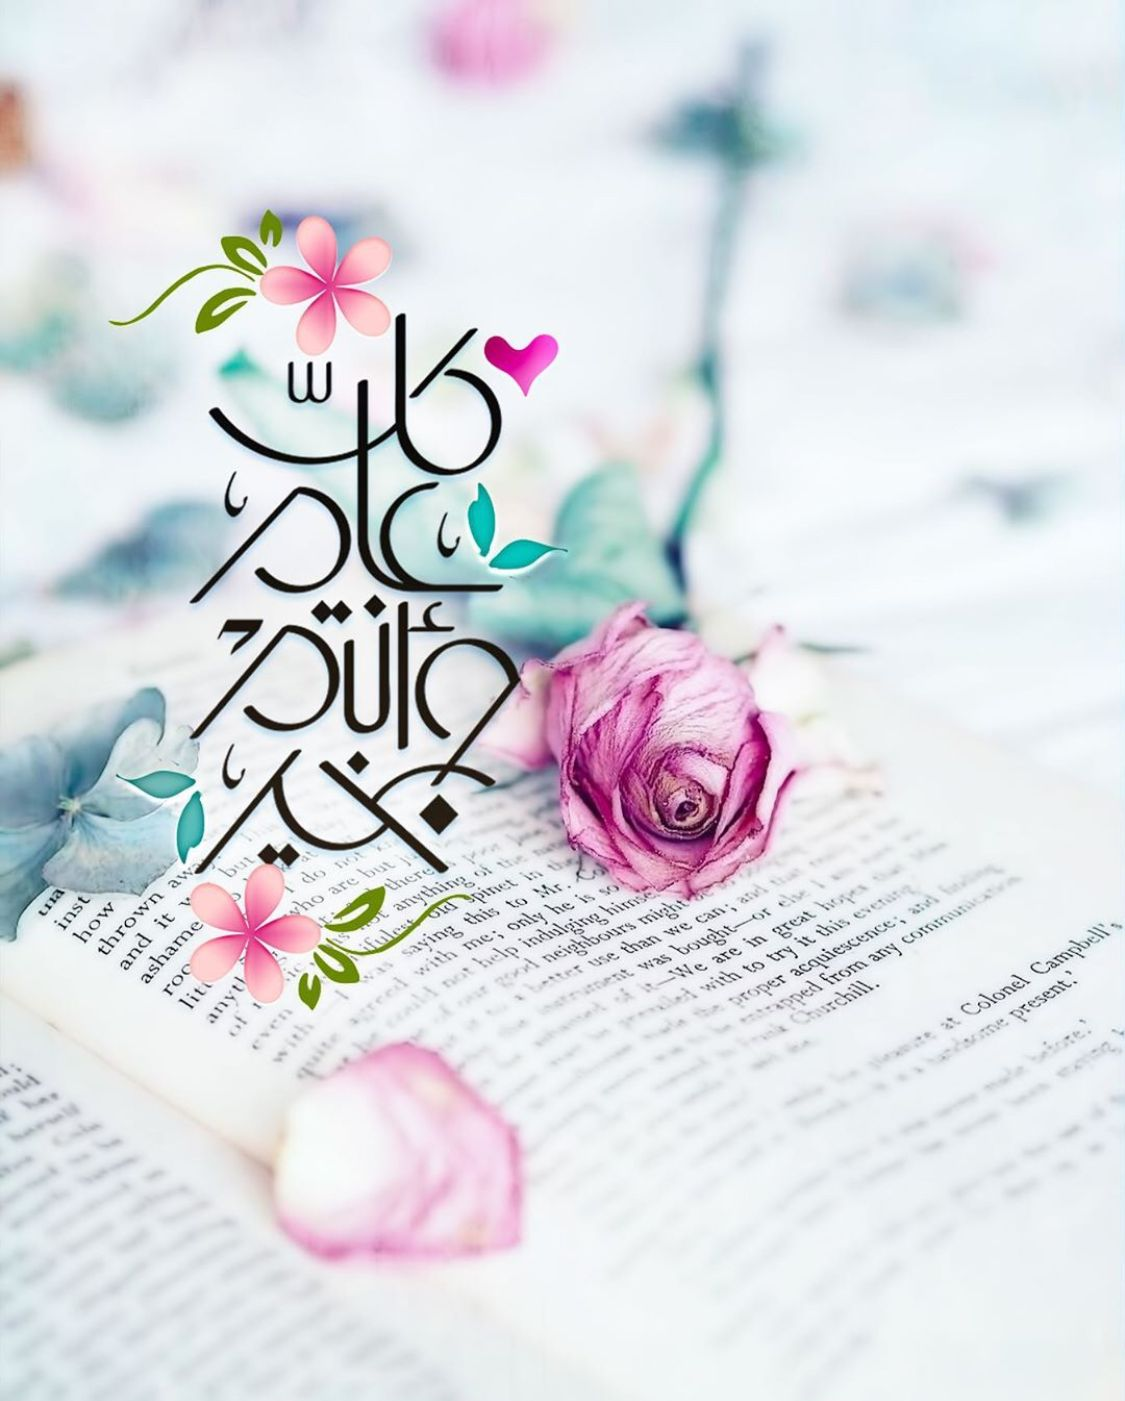 Pin By Manar On عيد الفطر عيد الأضحى Eid Mubark Islamic Wallpaper Hd Islamic Wallpaper Islamic Pictures